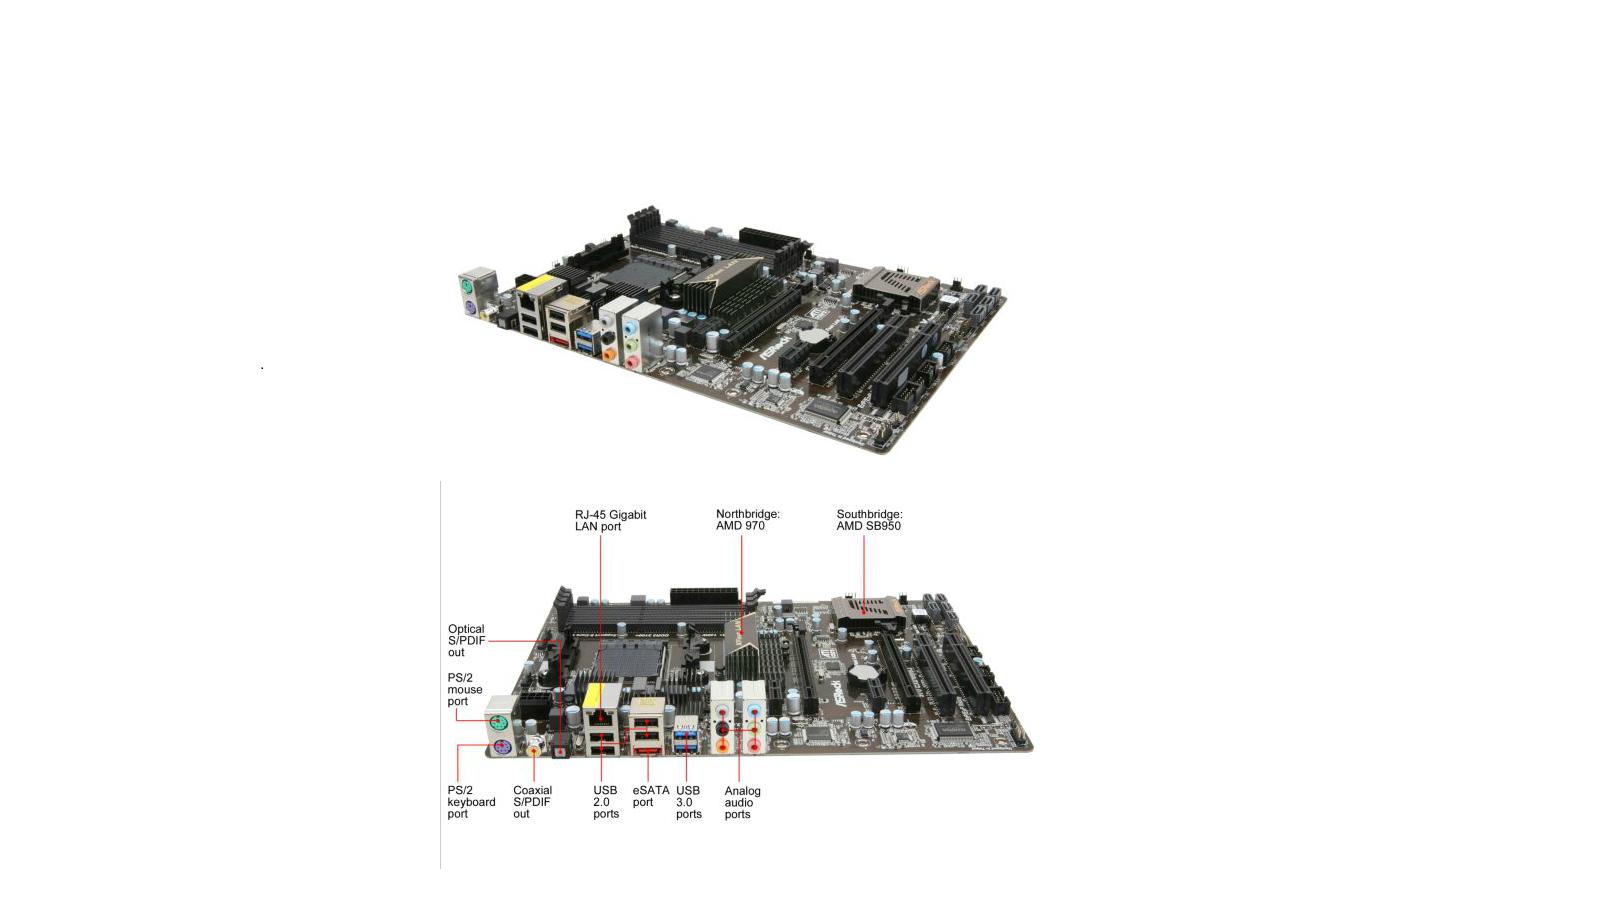 rj11 phone jack wiring diagram images usb memory wiring diagrams pictures wiring diagrams